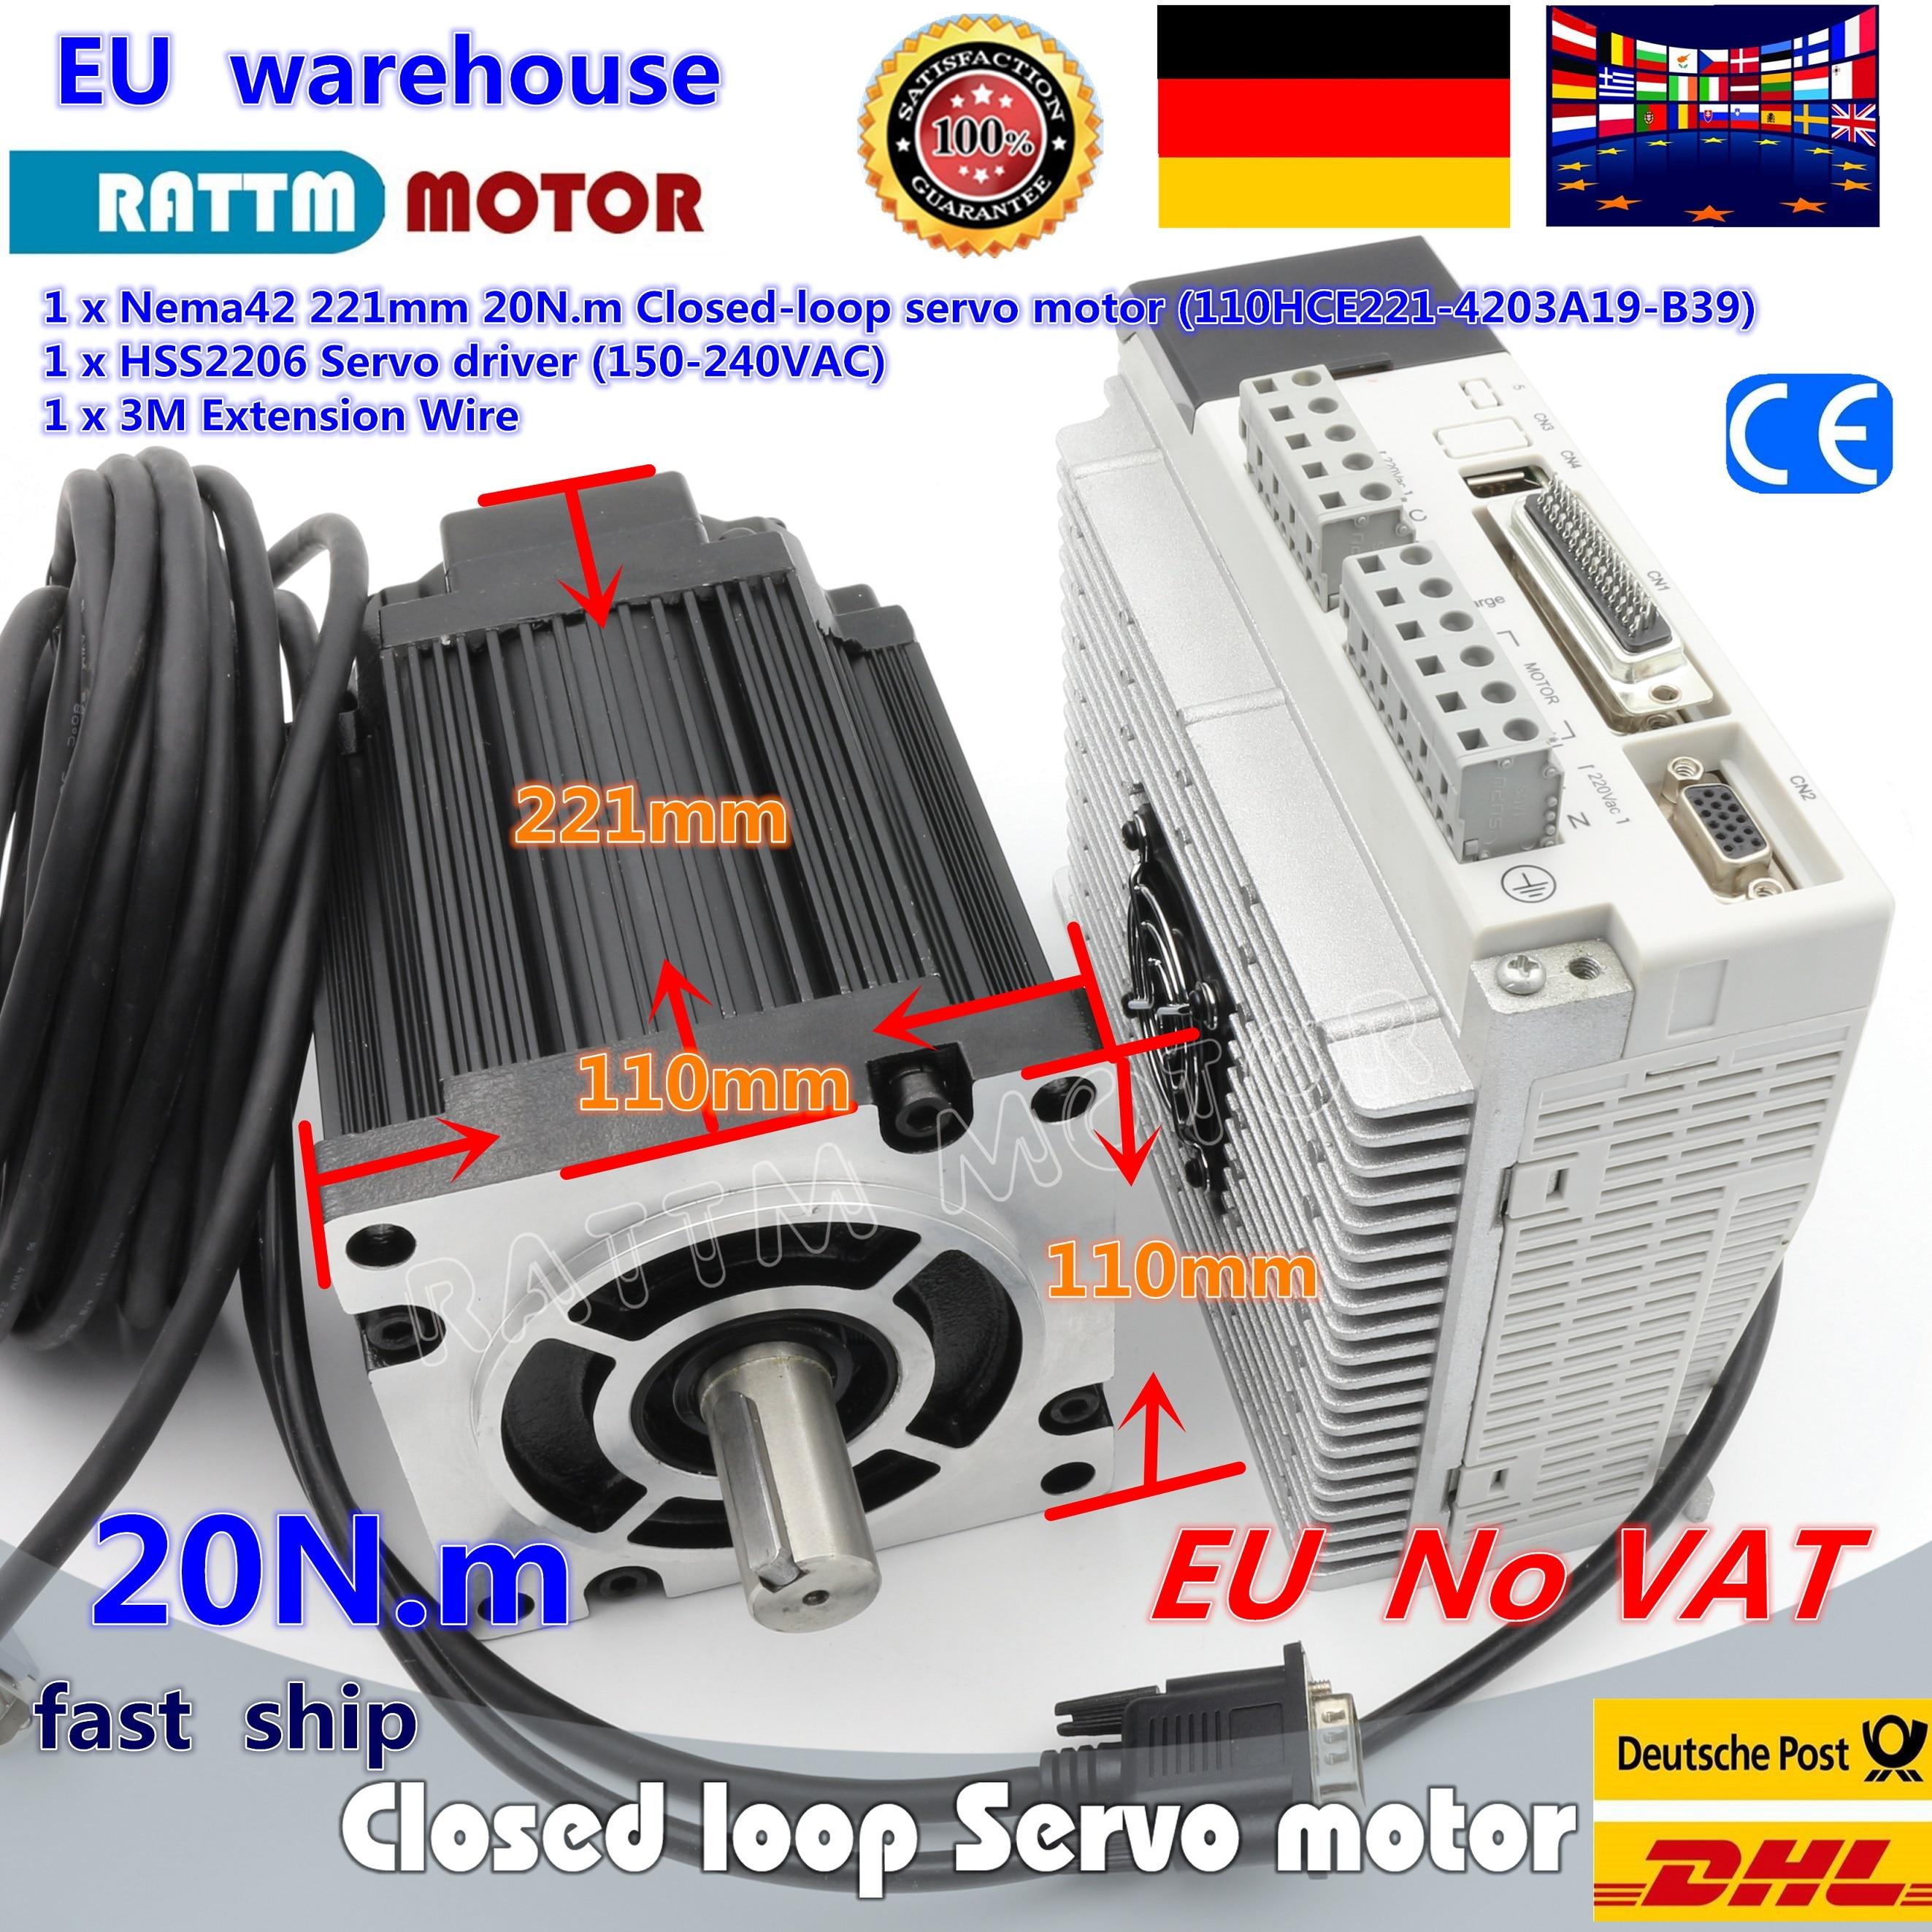 DE navio Nema42 Closed-loop Servo motor 20N. m/2880oz-in 110 Híbrido stepper motor & 3-fase Passo-Motorista servo Kit Controlador CNC